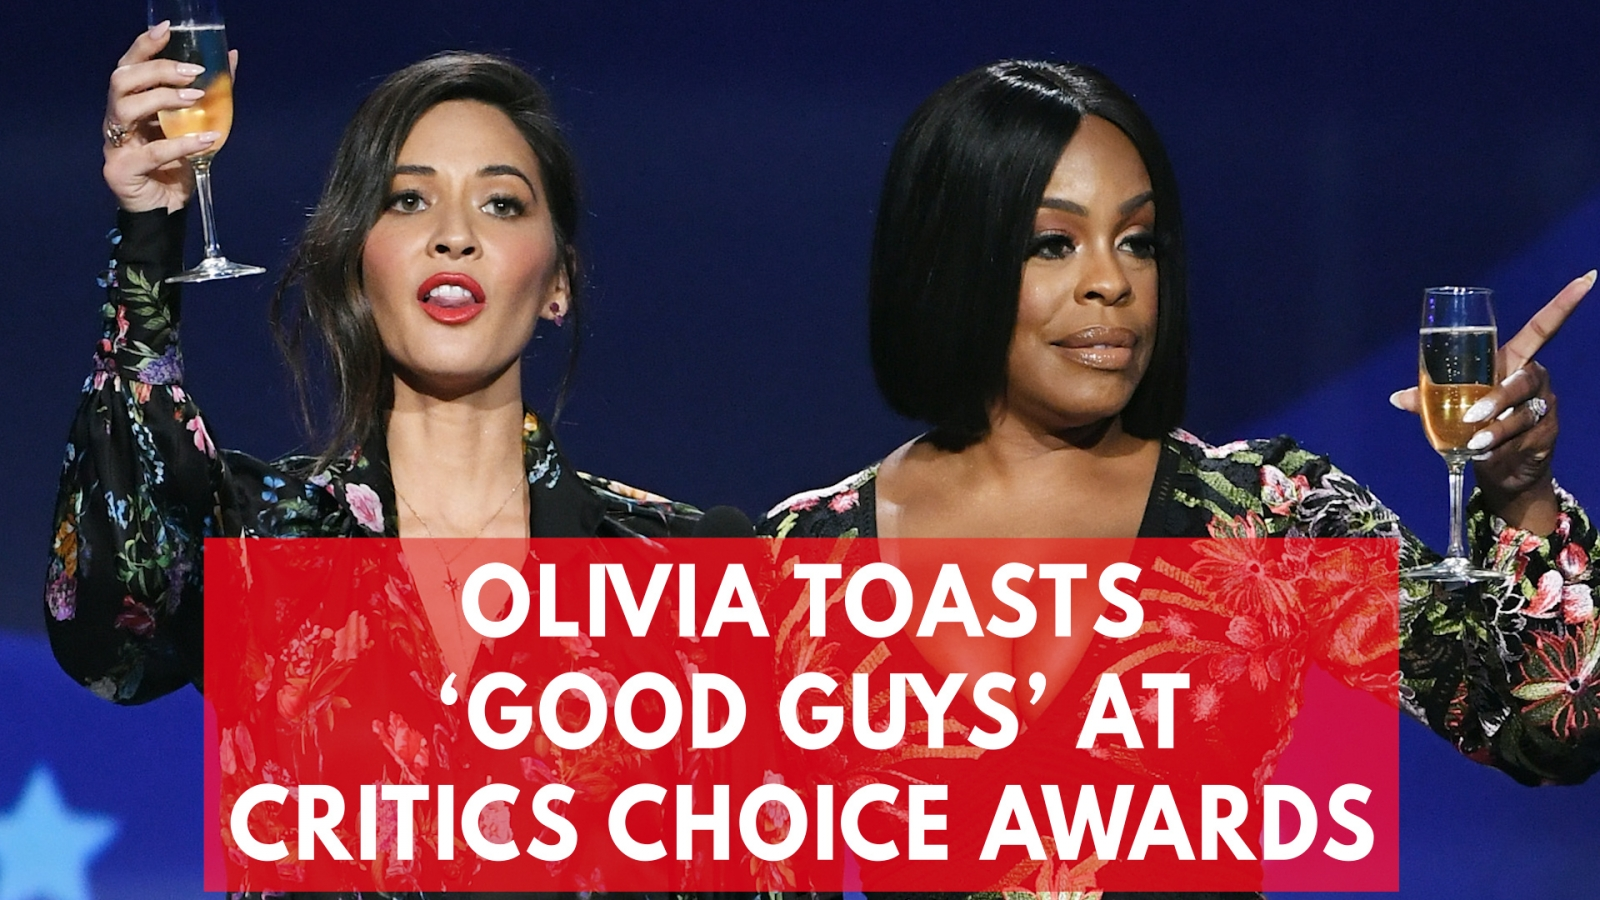 olivia-munn-and-niecy-nash-sarcastically-toasts-the-good-guys-at-critics-choice-awards